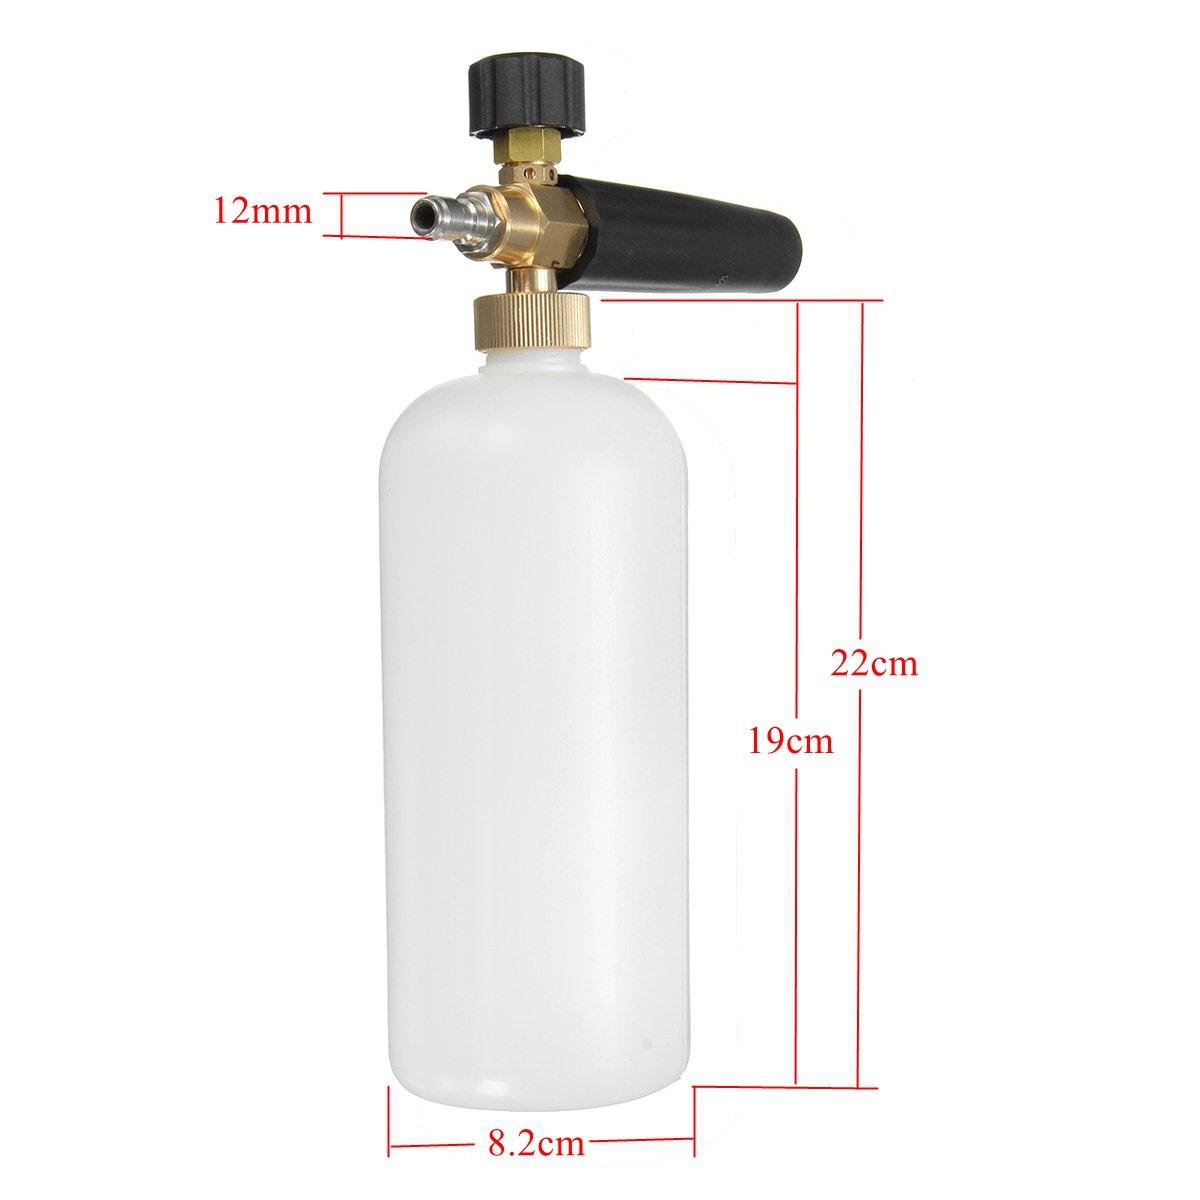 Amazon.com: ELUTO Botella pistola para lavar el auto ...